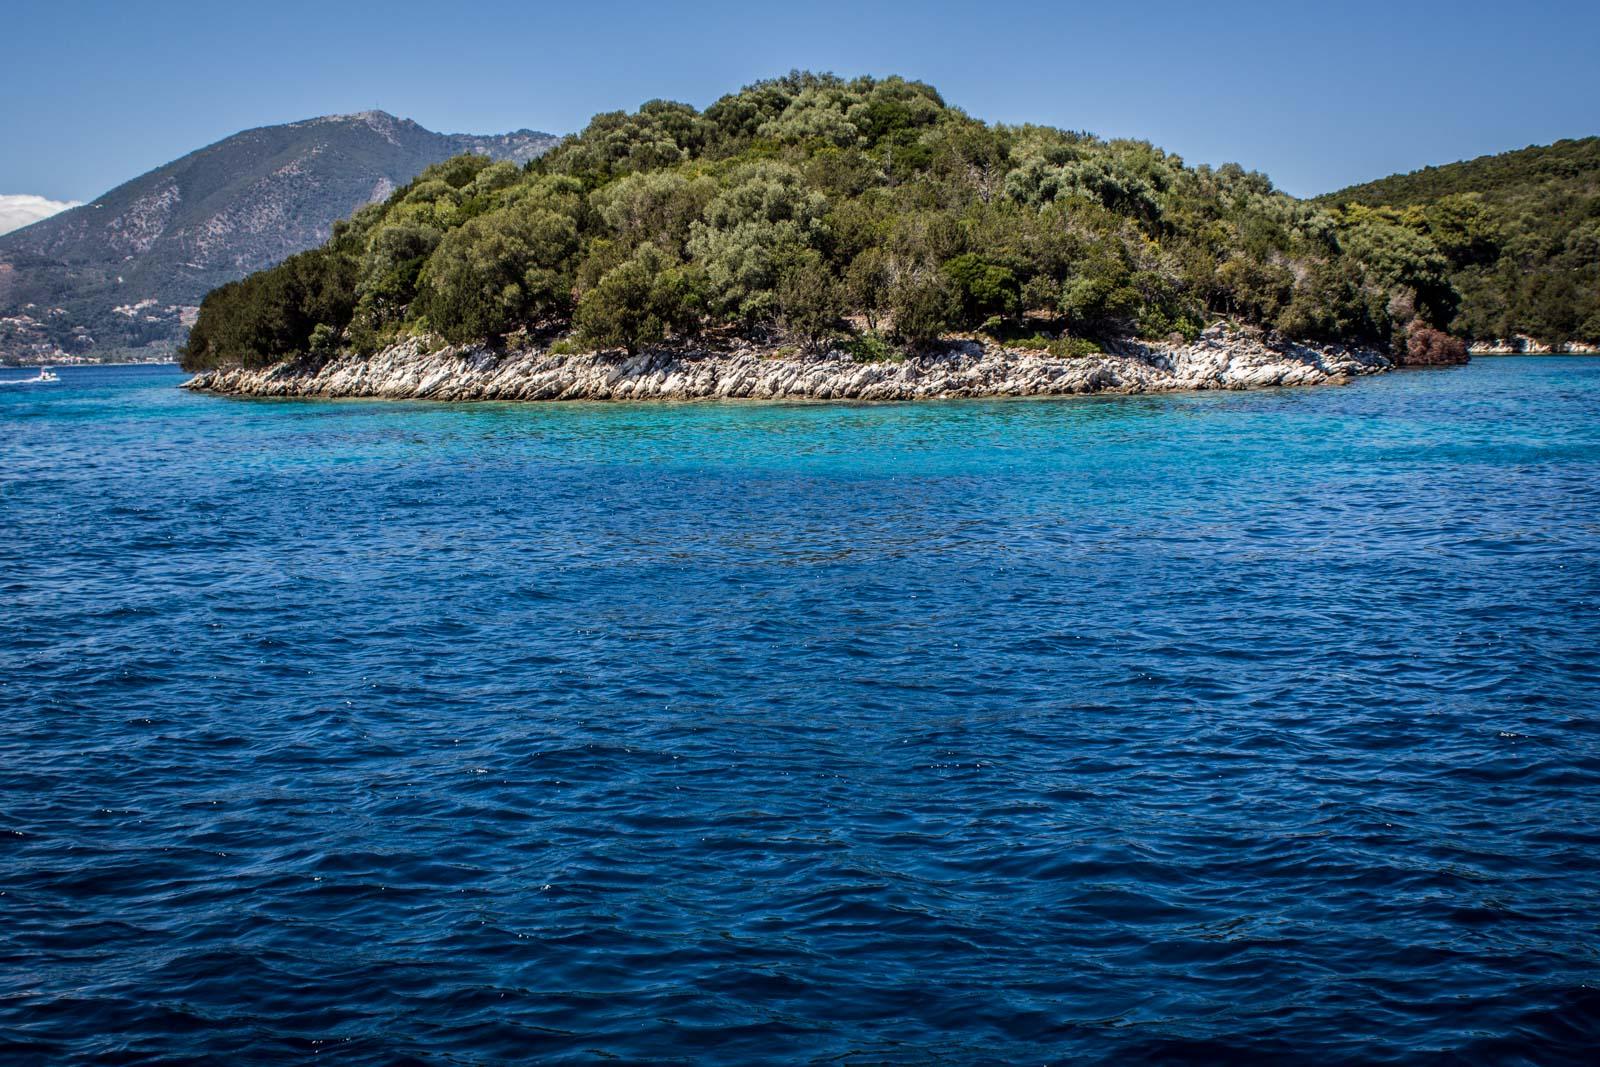 jackie onassis naked, skorpios, greek islands, aristotle onassis